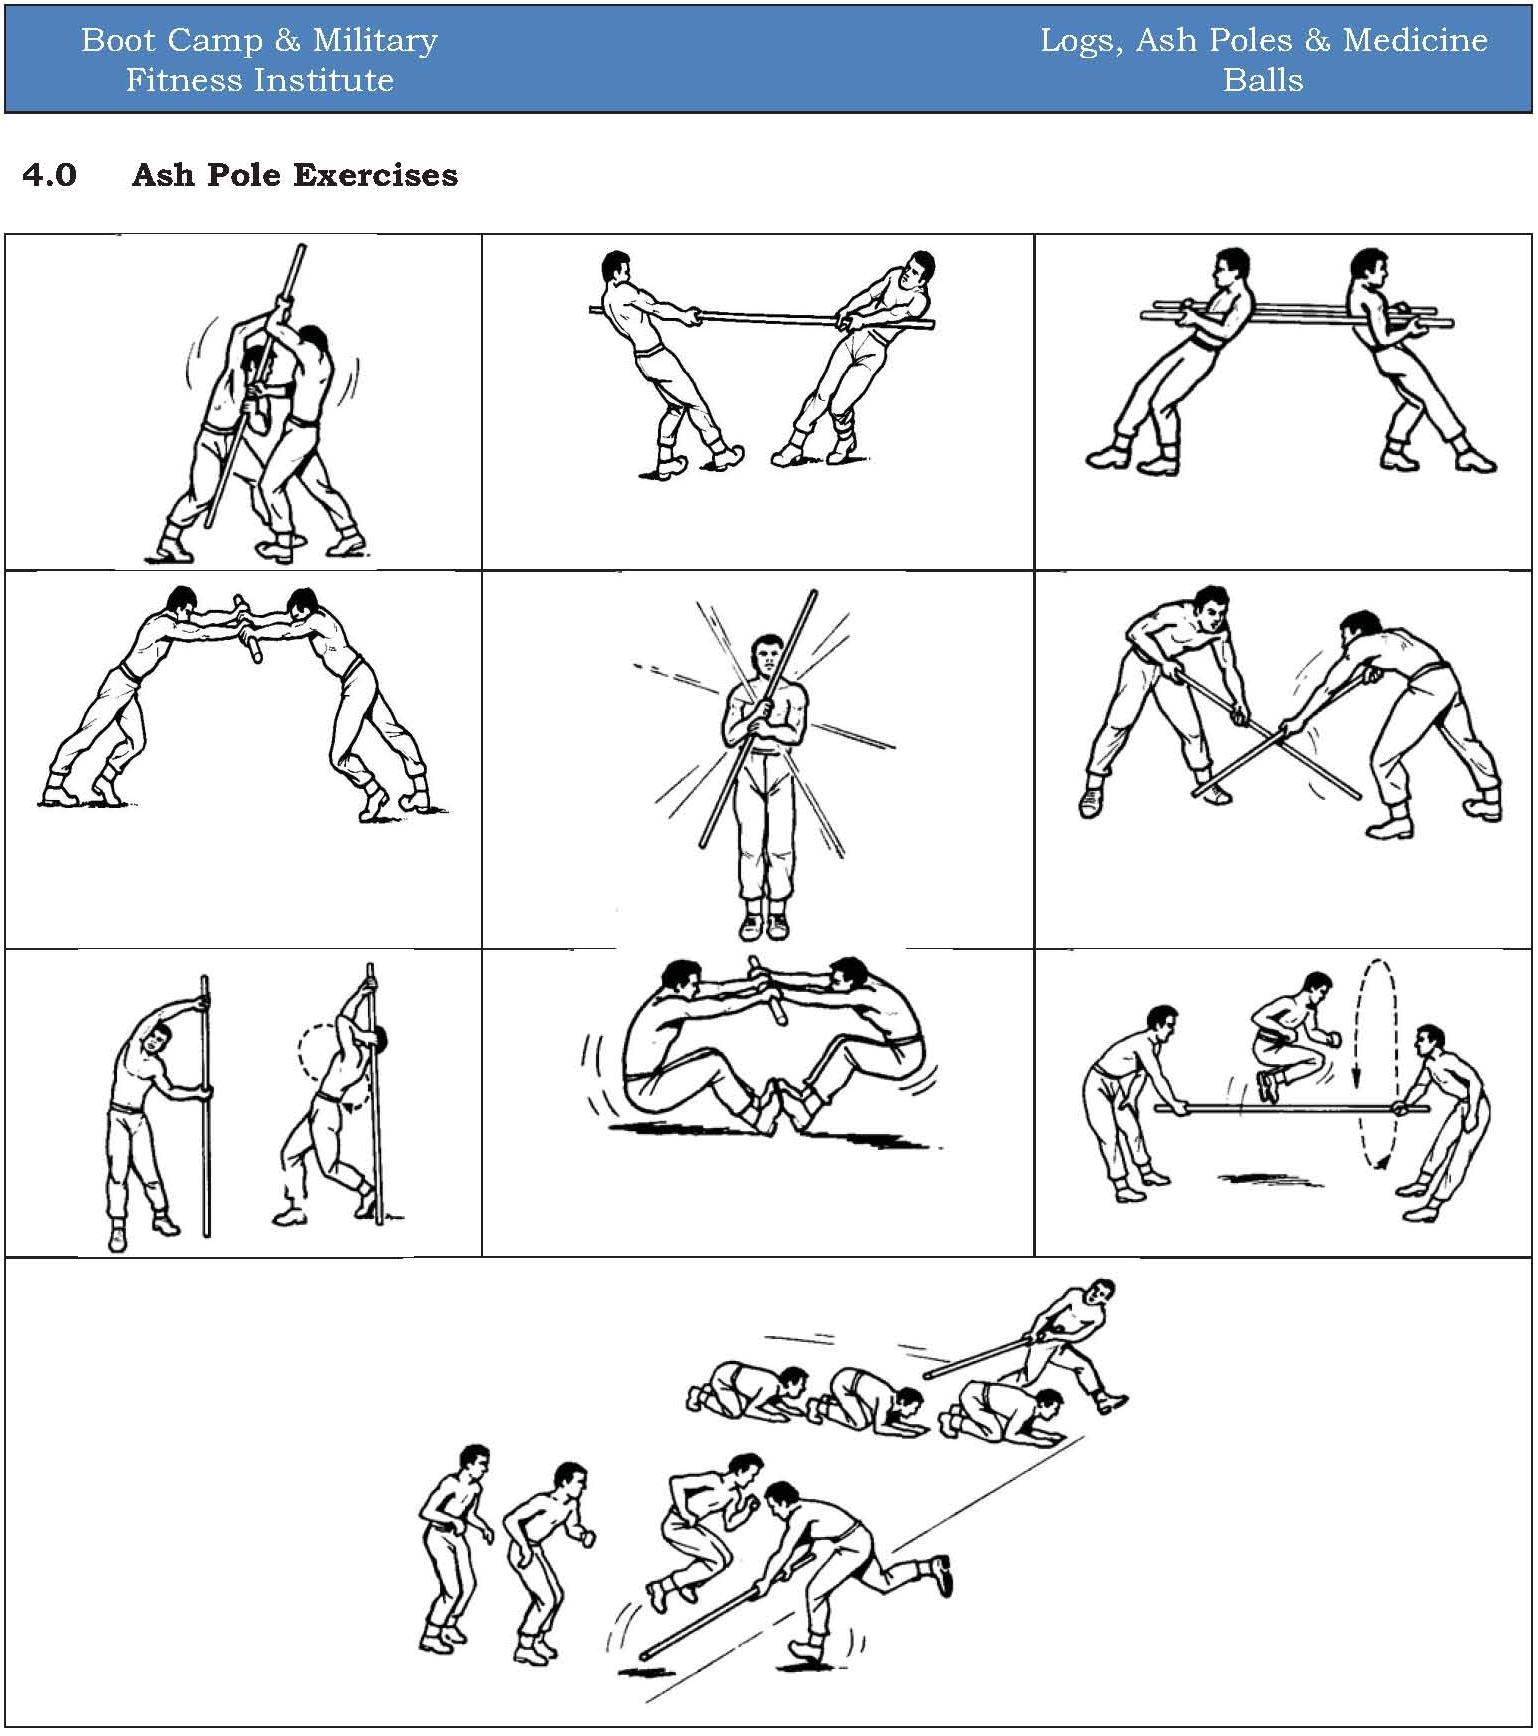 Exercise, Ash Poles